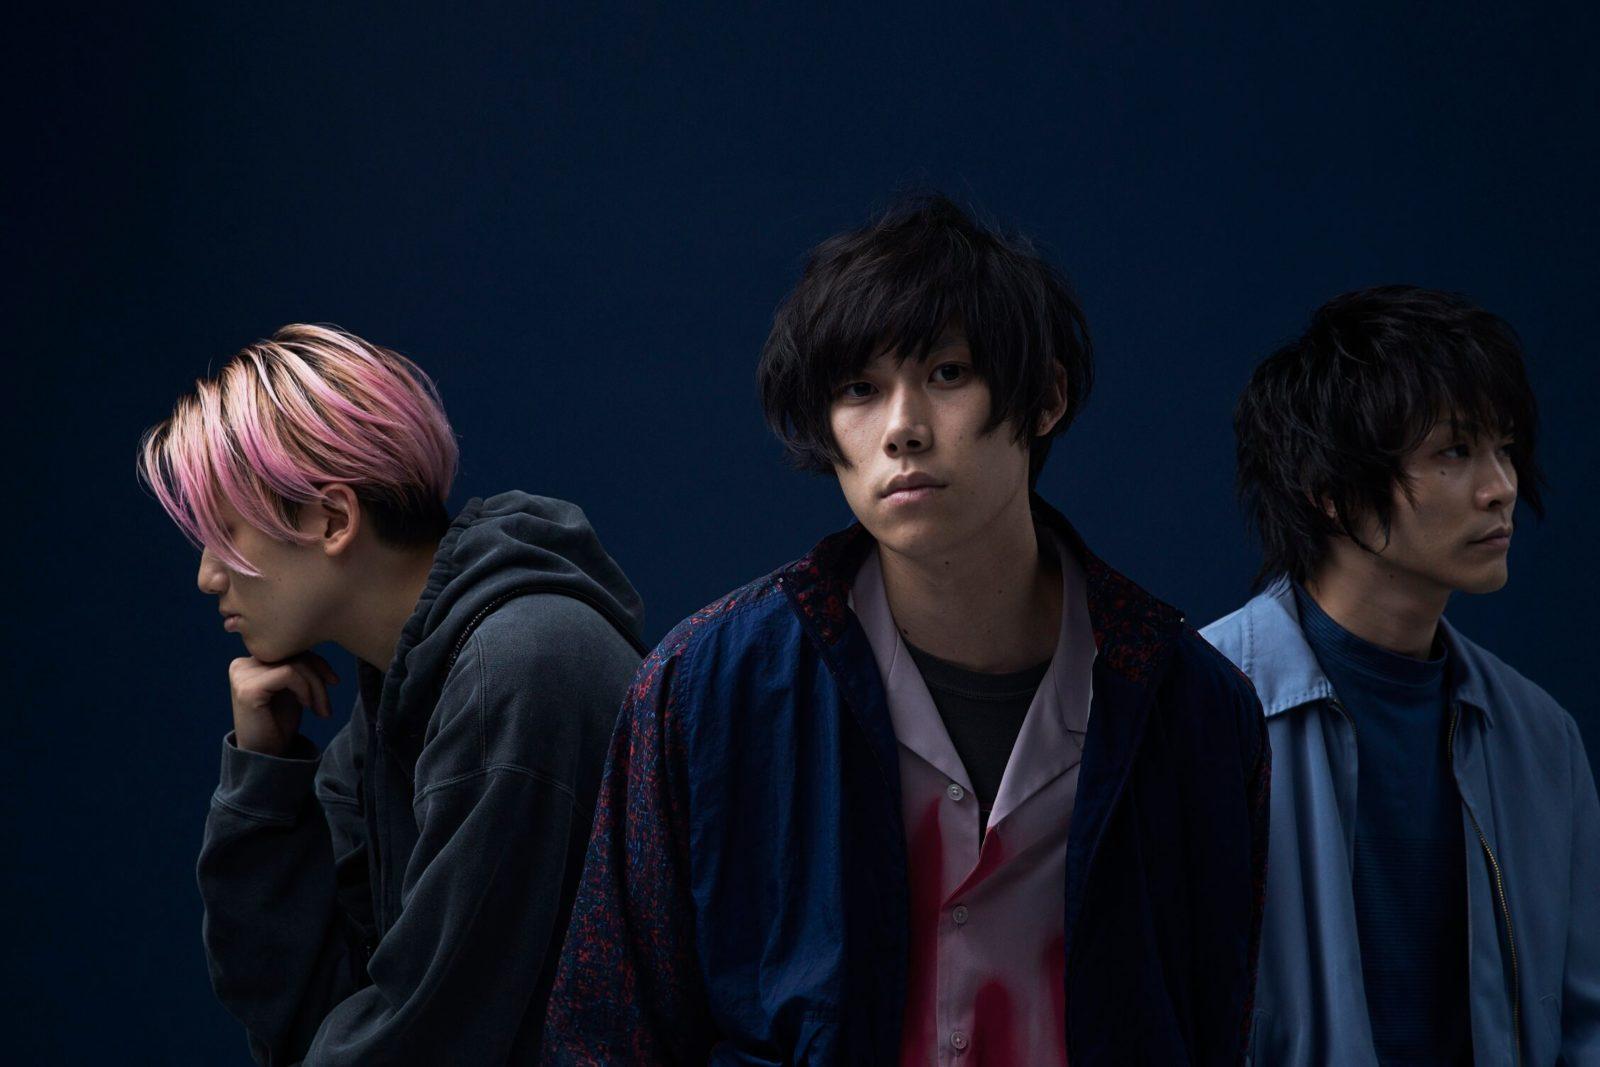 PELICAN FANCLUB、メジャーデビュー作「Boys just want to be culture」の収録内容 & ジャケットアートワークを公開!